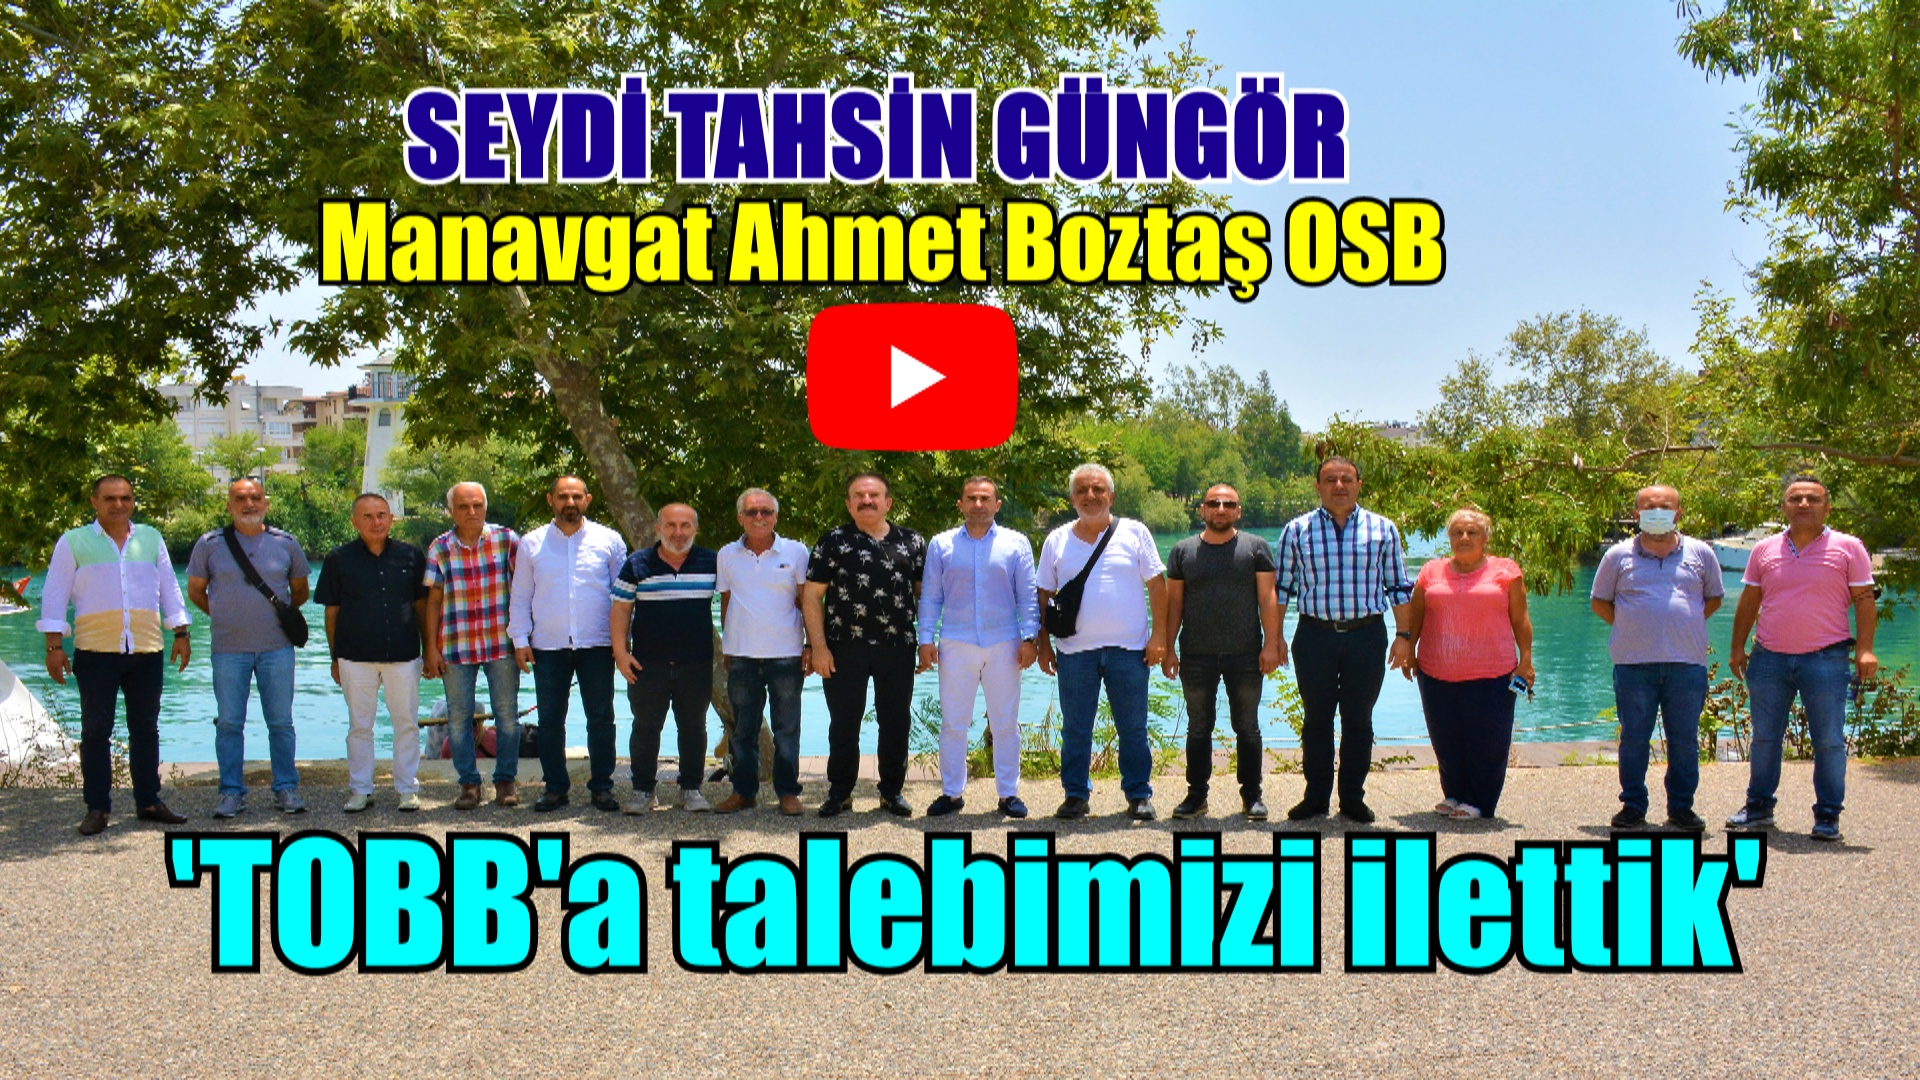 Manavgat Ahmet Boztaş OSB